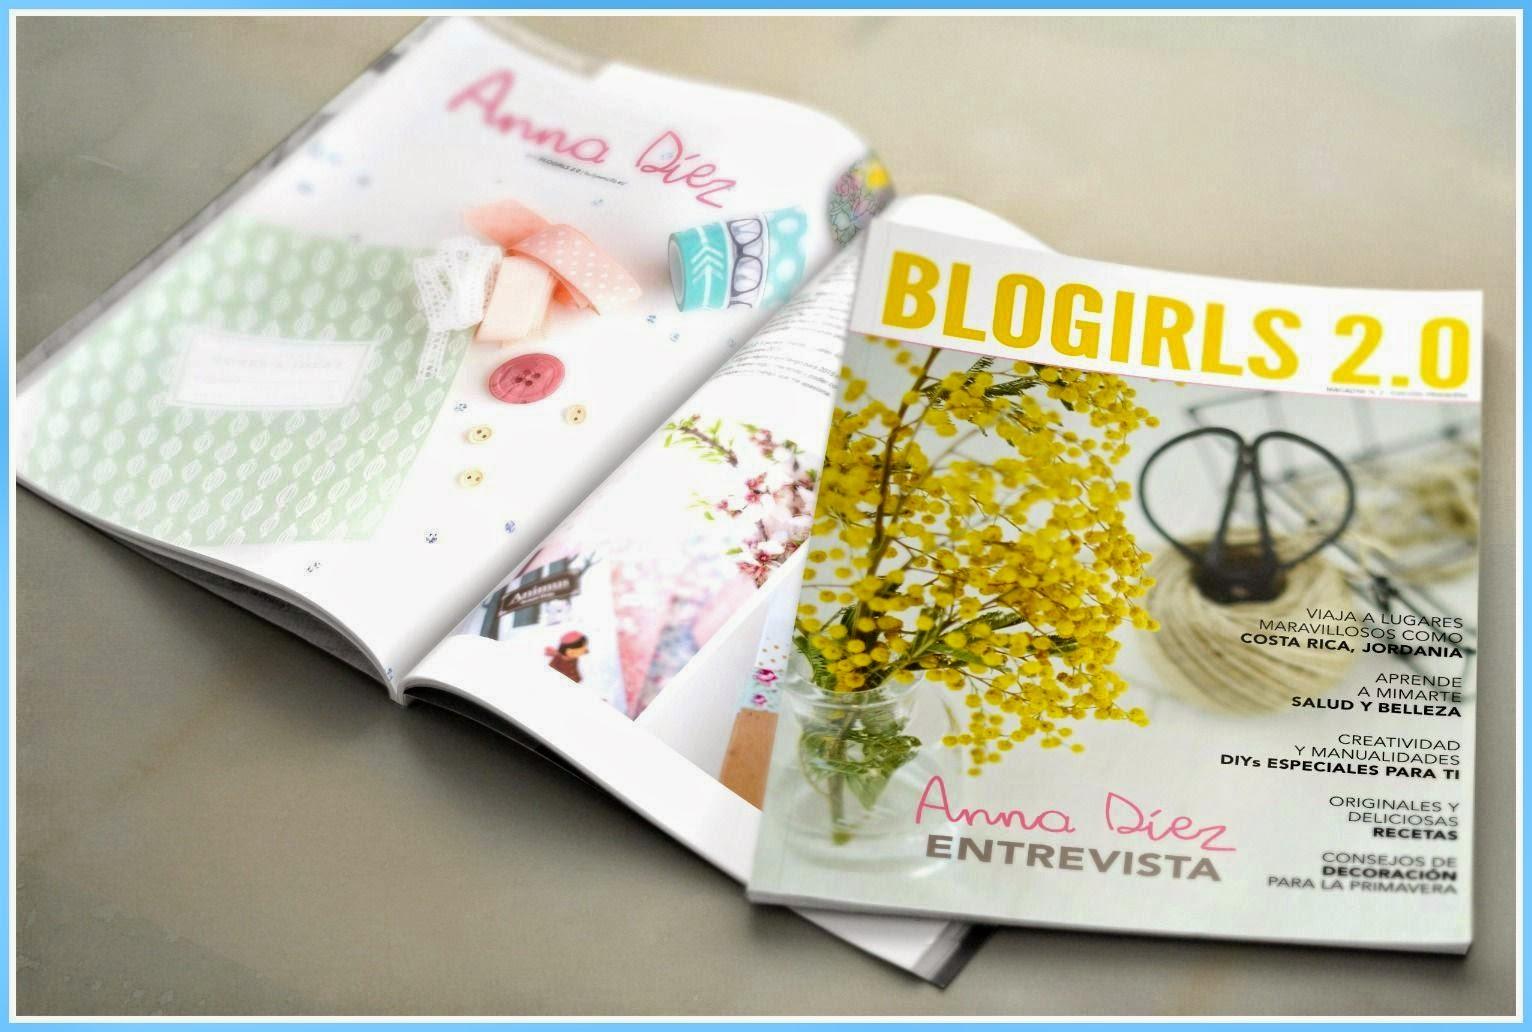 blogirlsn2primavera_0